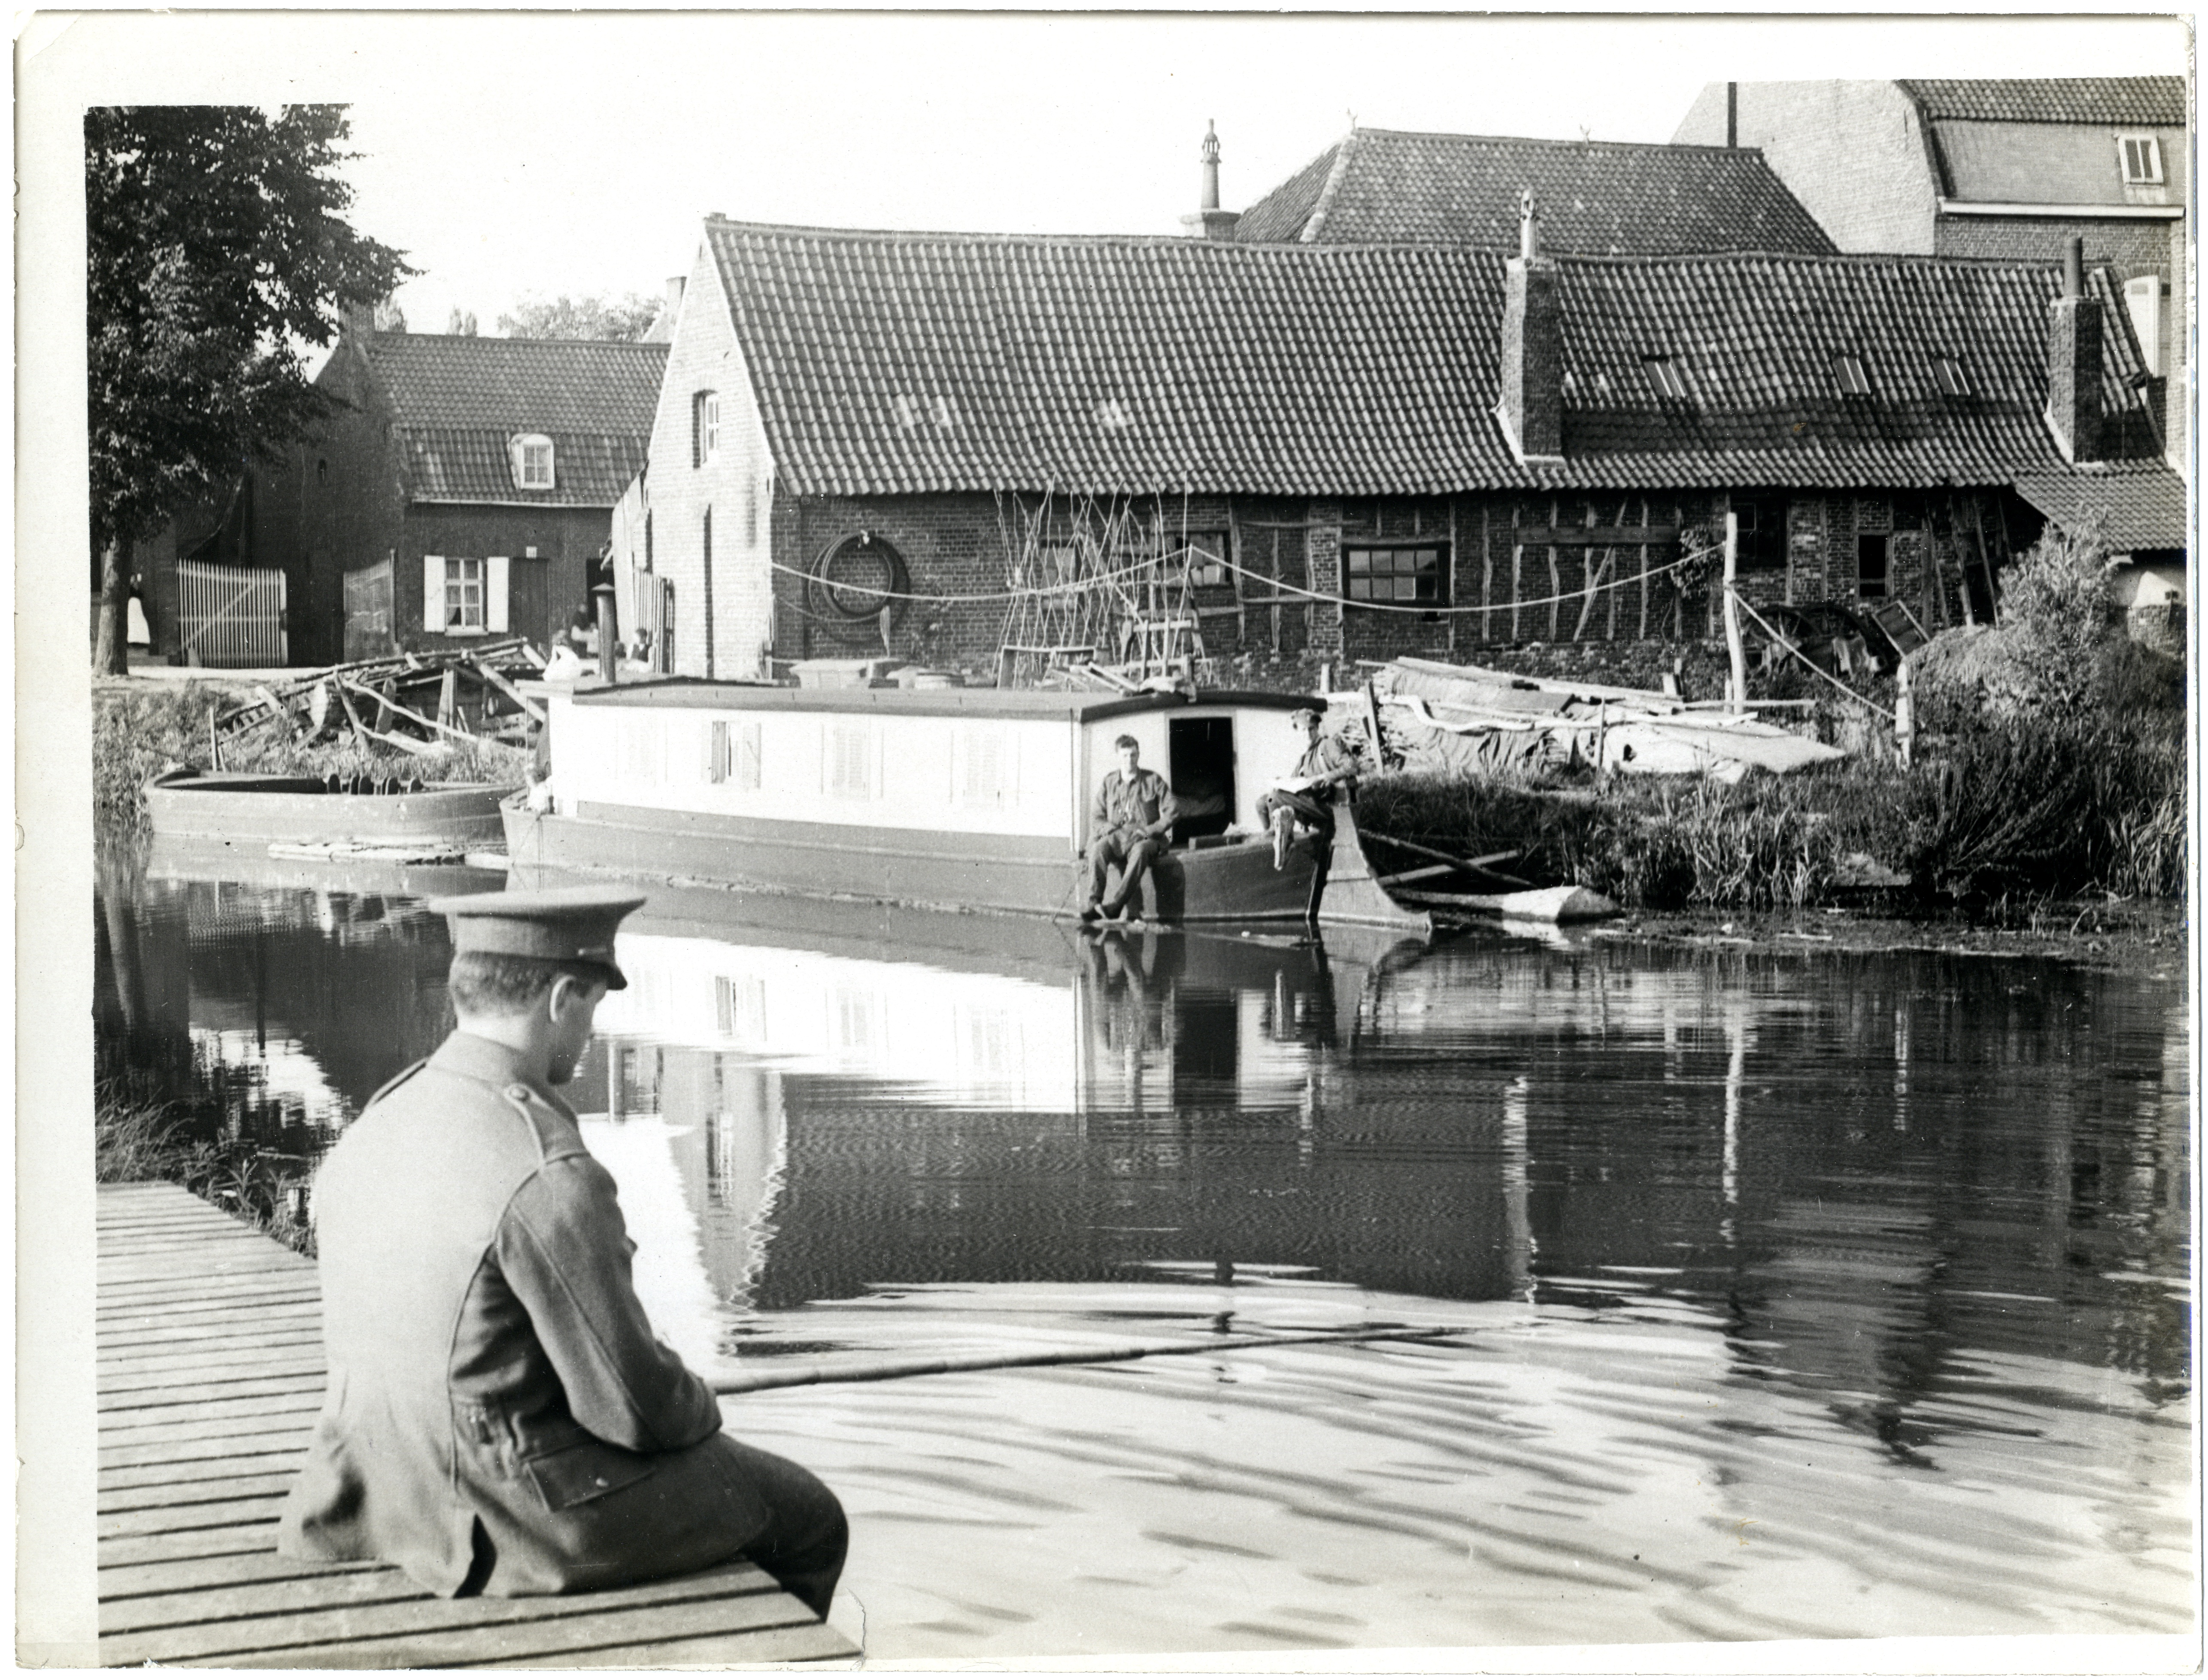 file fishing in a flanders canal near merville photographer h d girdwood 13875331003. Black Bedroom Furniture Sets. Home Design Ideas